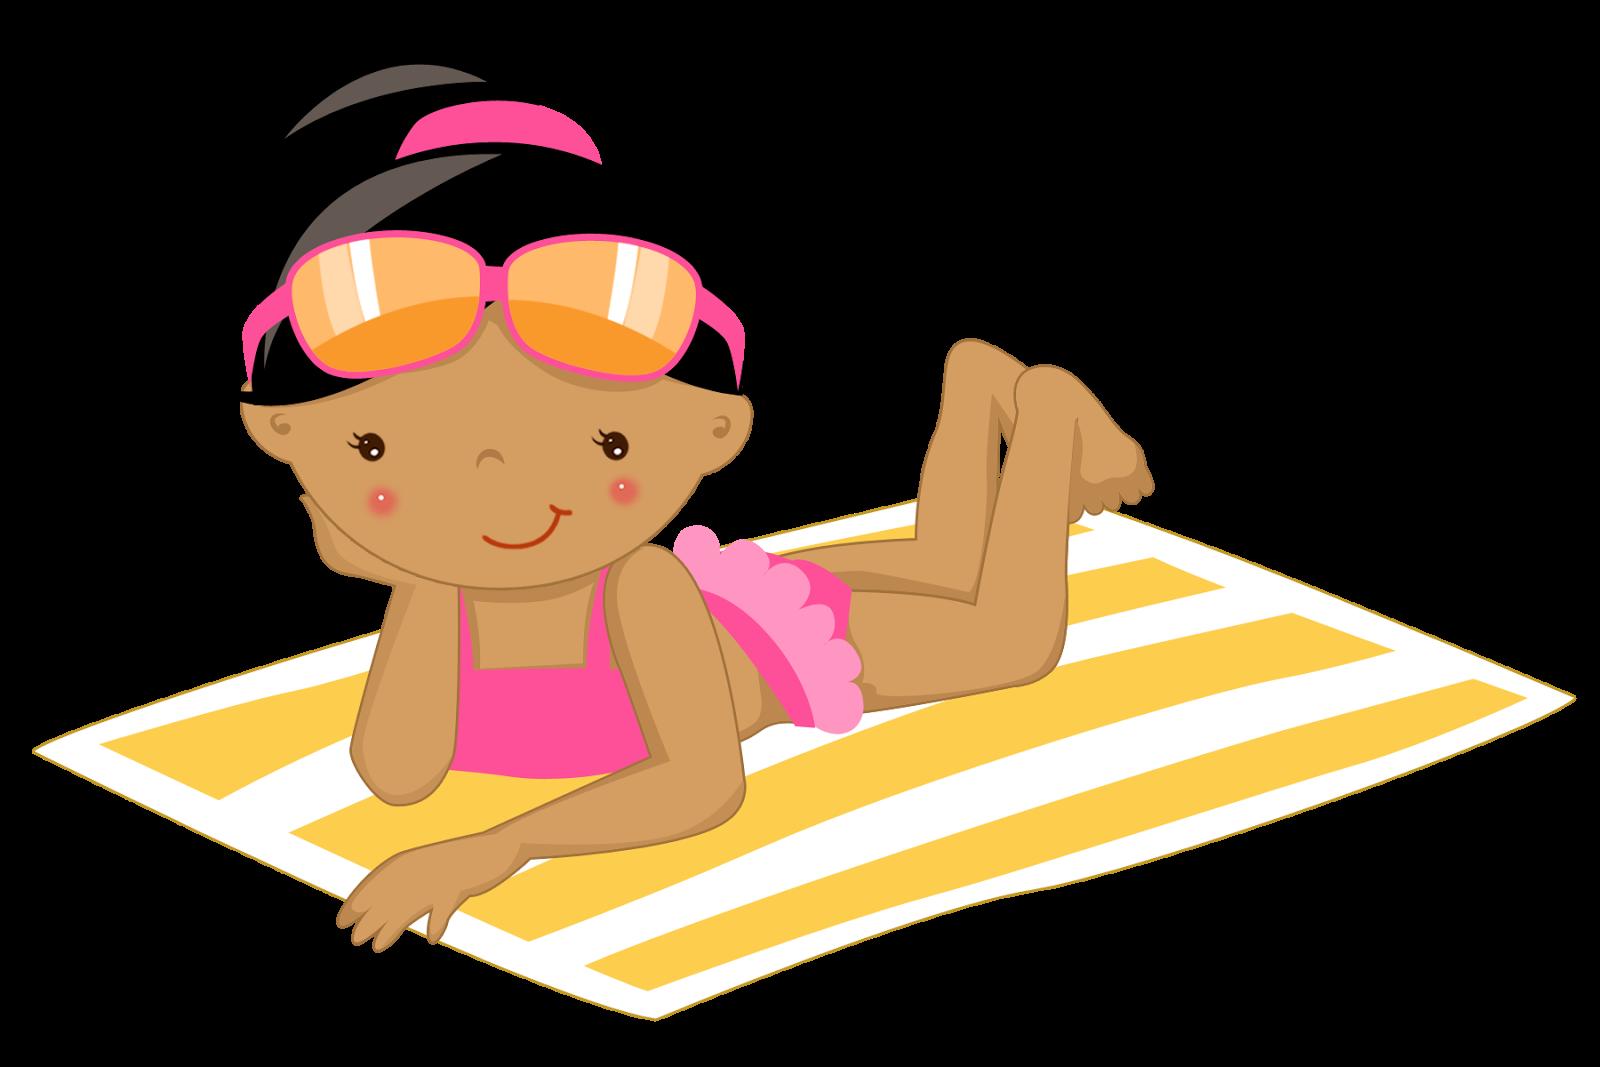 Enjoying the Beach Clipart. | Oh My Fiesta! in english